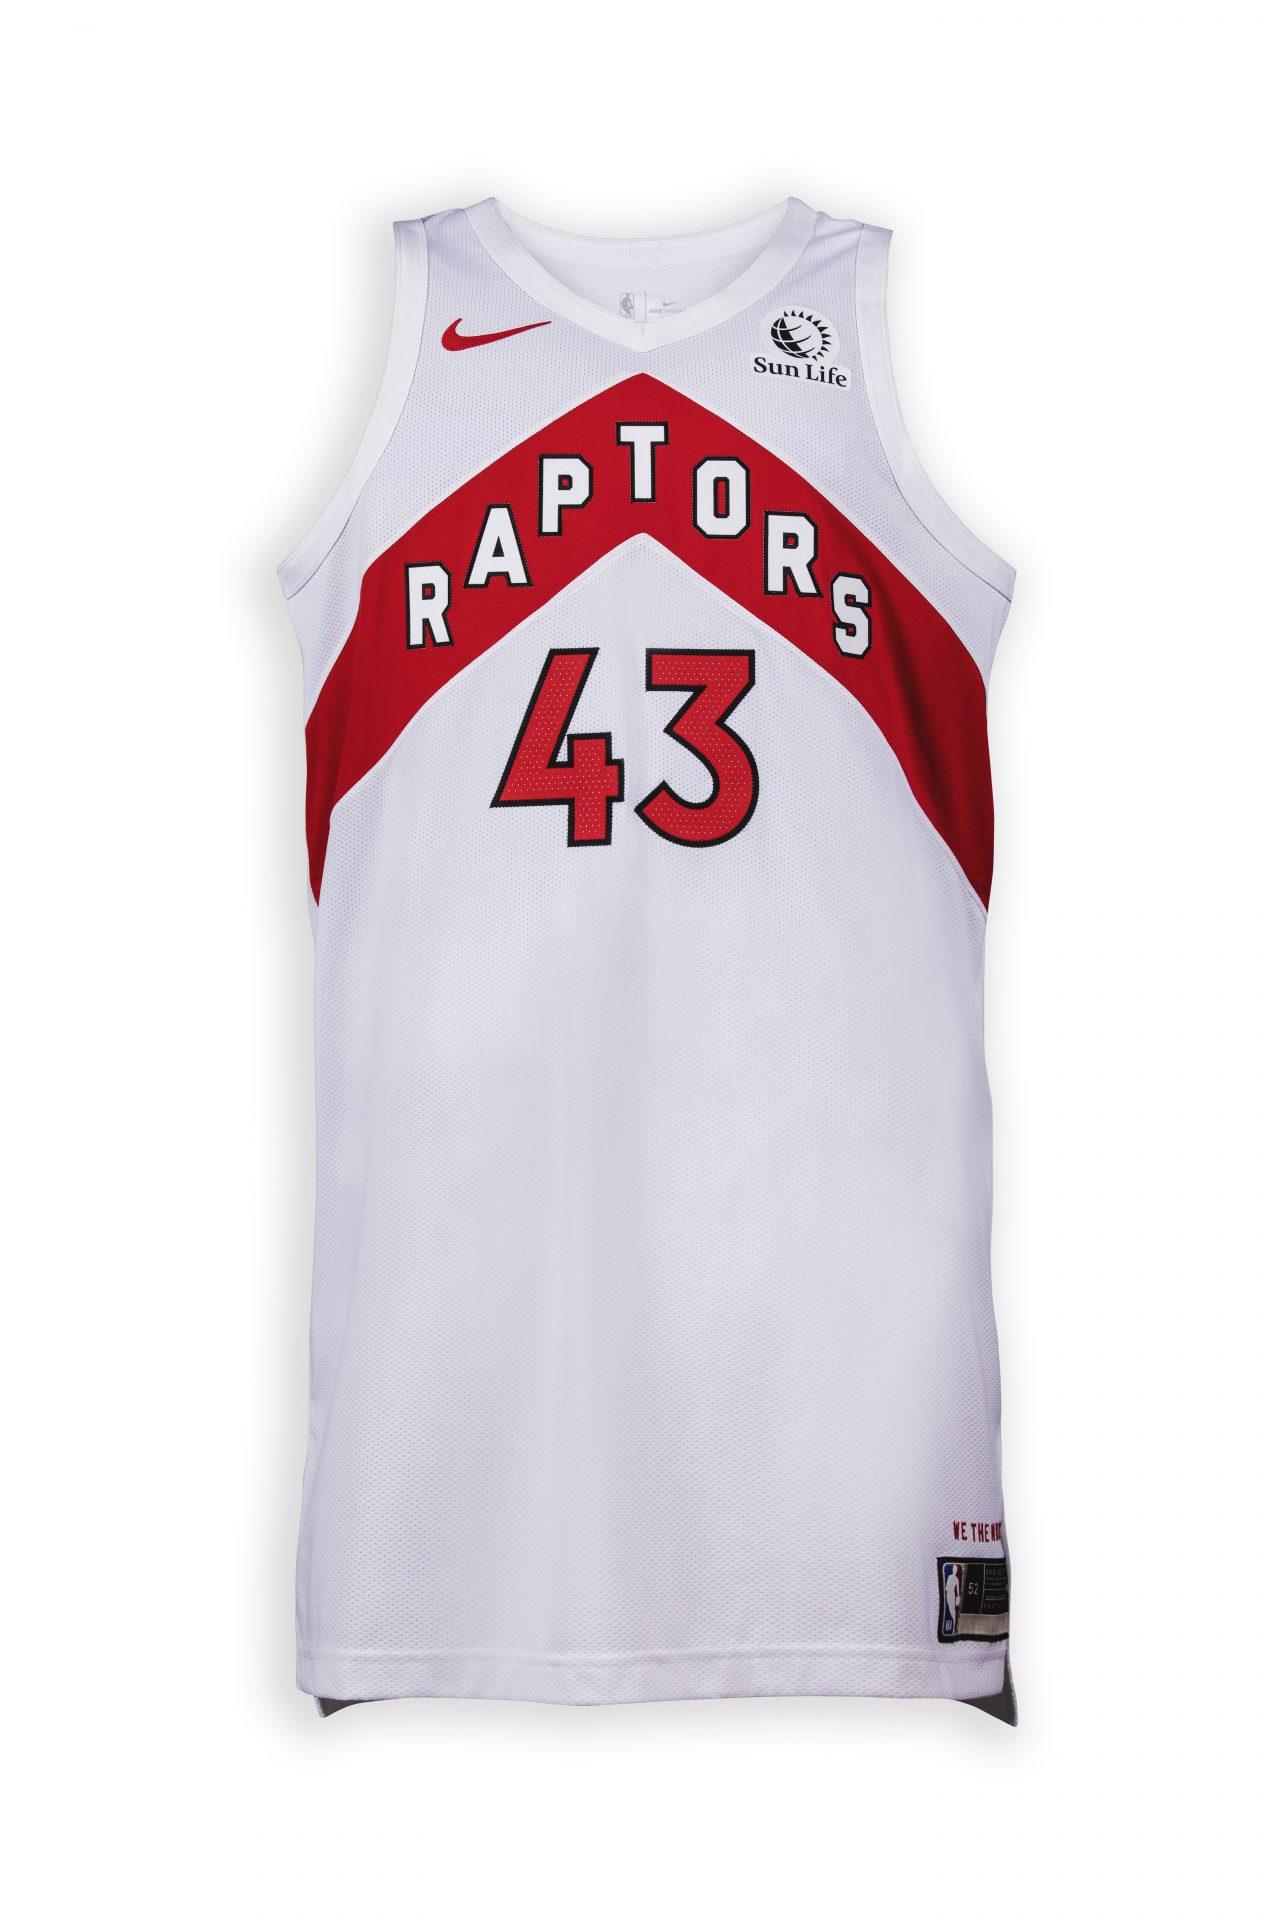 new Toronto Raptors jersey